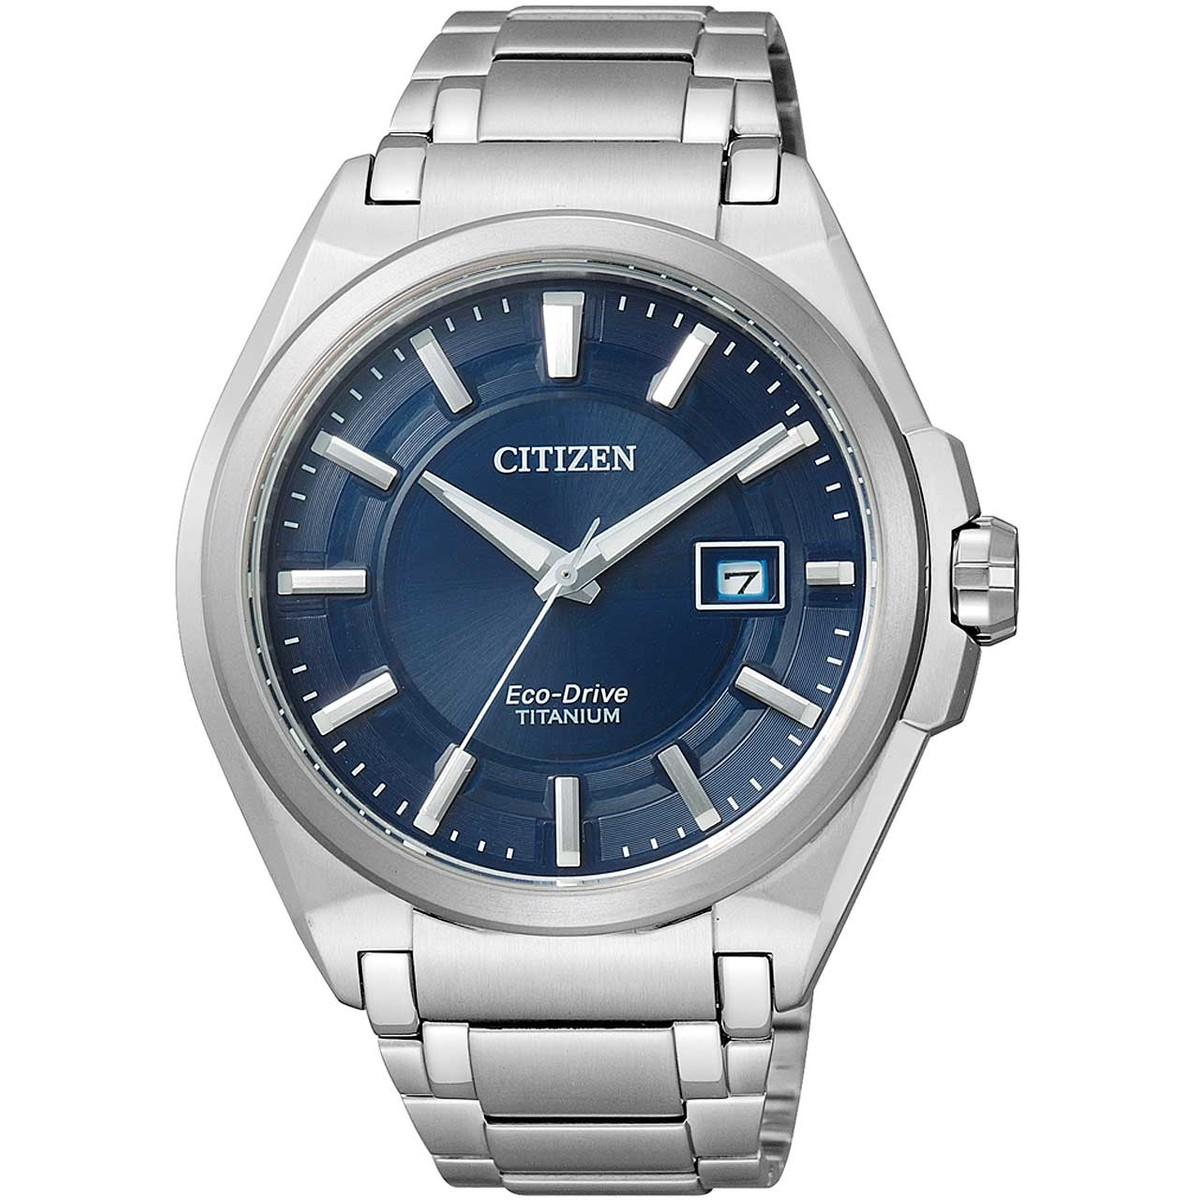 Ceas barbatesc Citizen Eco-Drive Titanium BM6930-57M de mana original